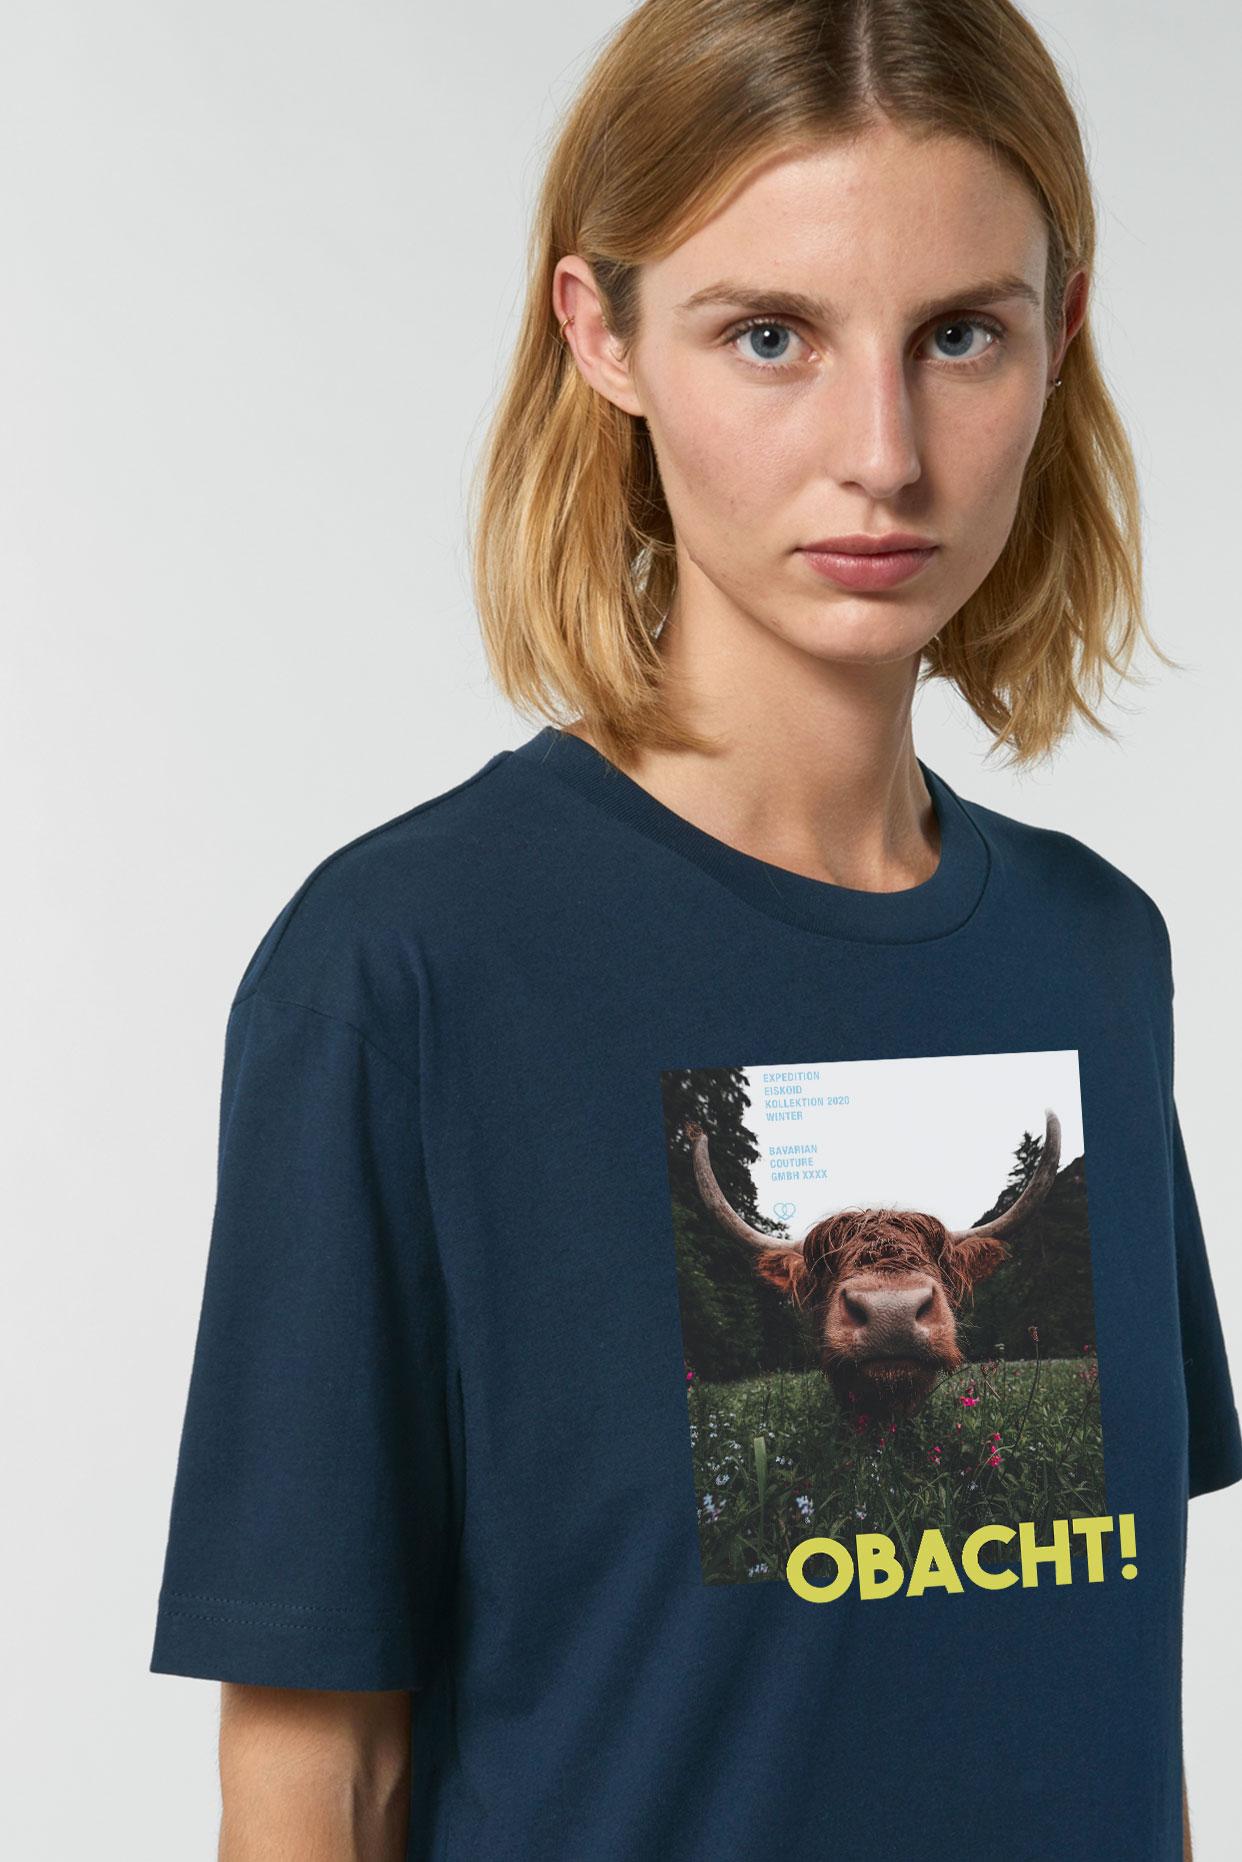 Obacht Unisex T-Shirt